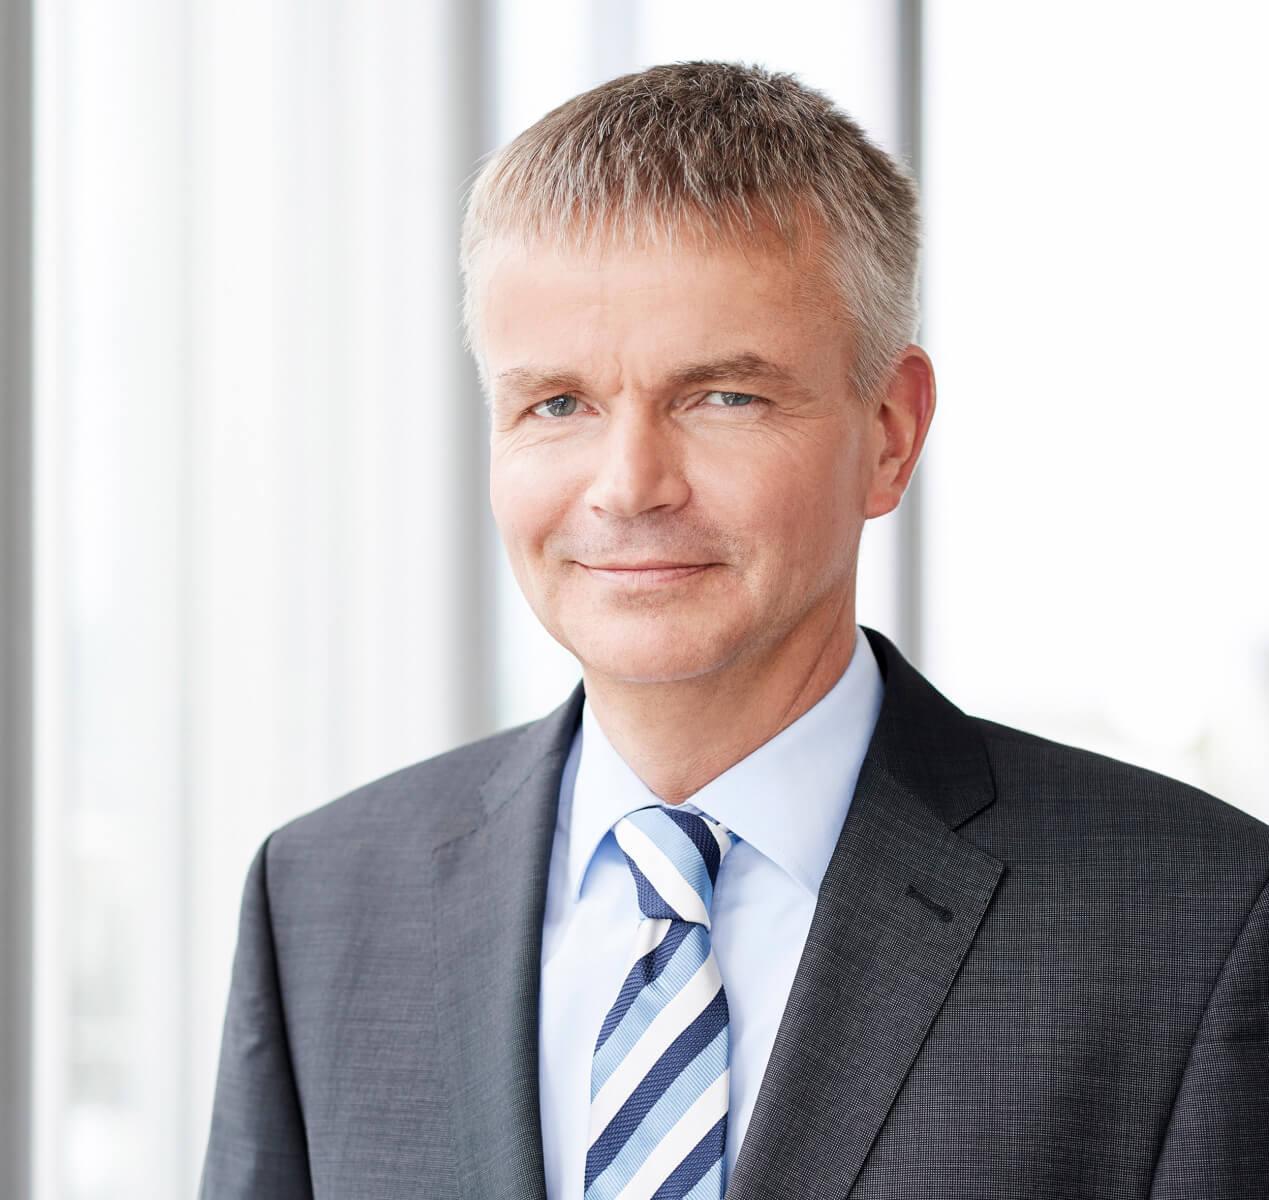 Dr. Andreas Nolte Profile Image